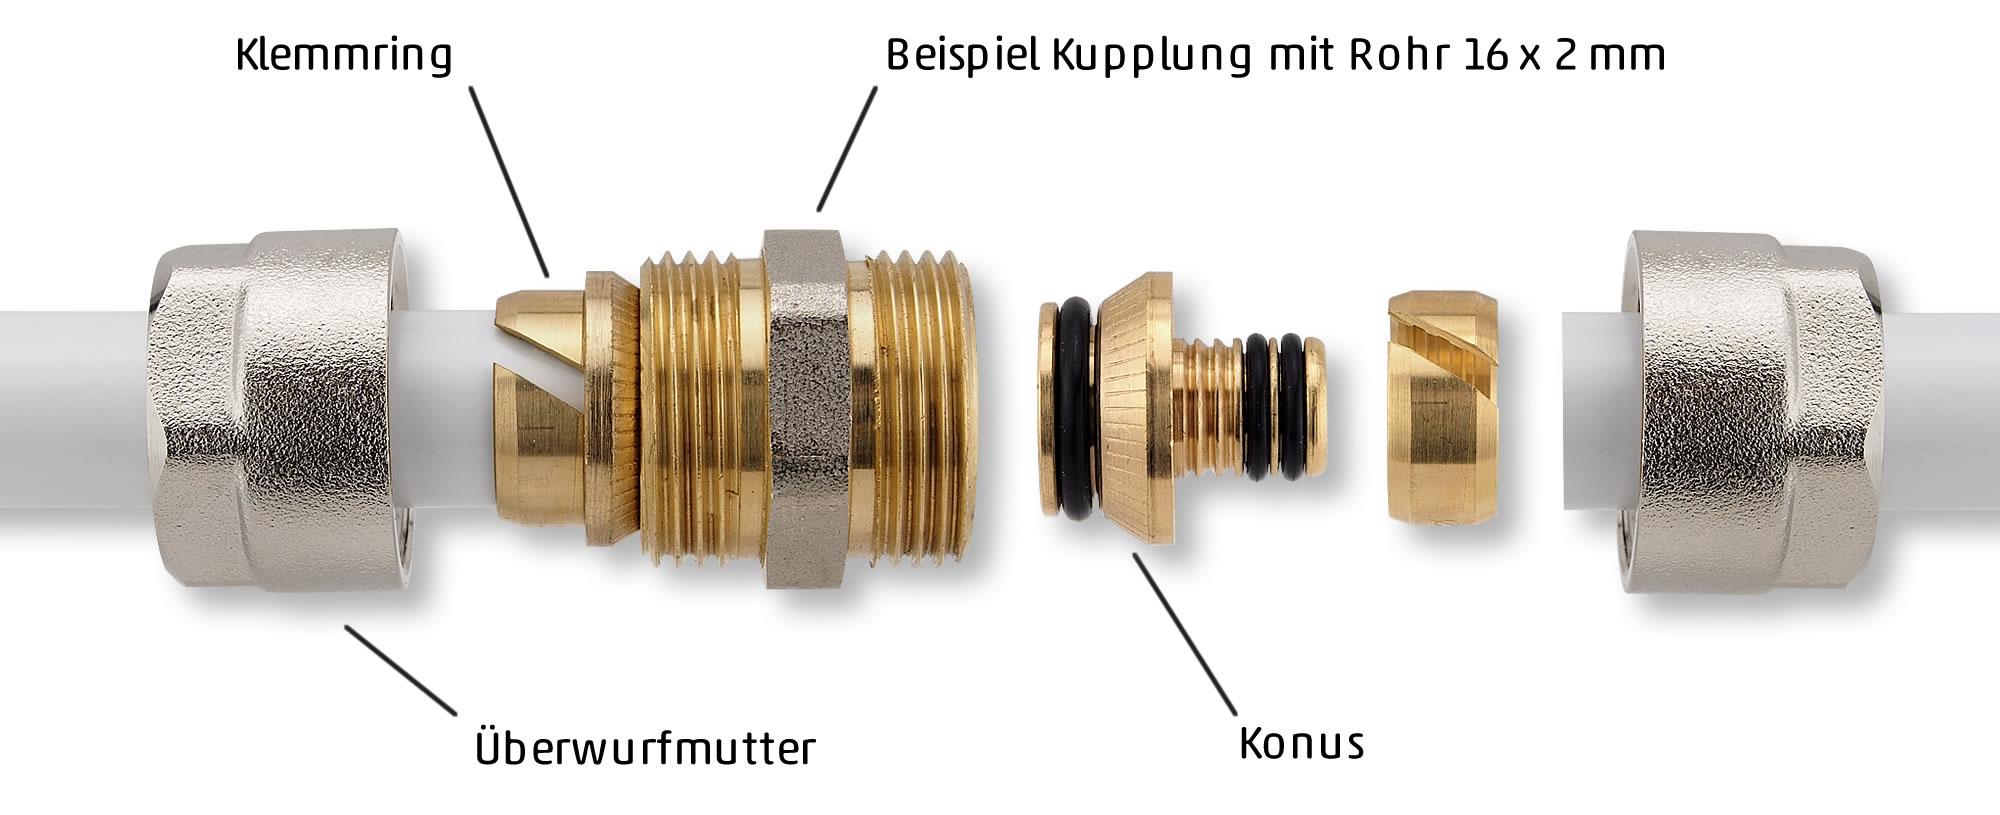 Bekannte Schraubfittings CONNECT & EUROKONUS | heima24.de RA38